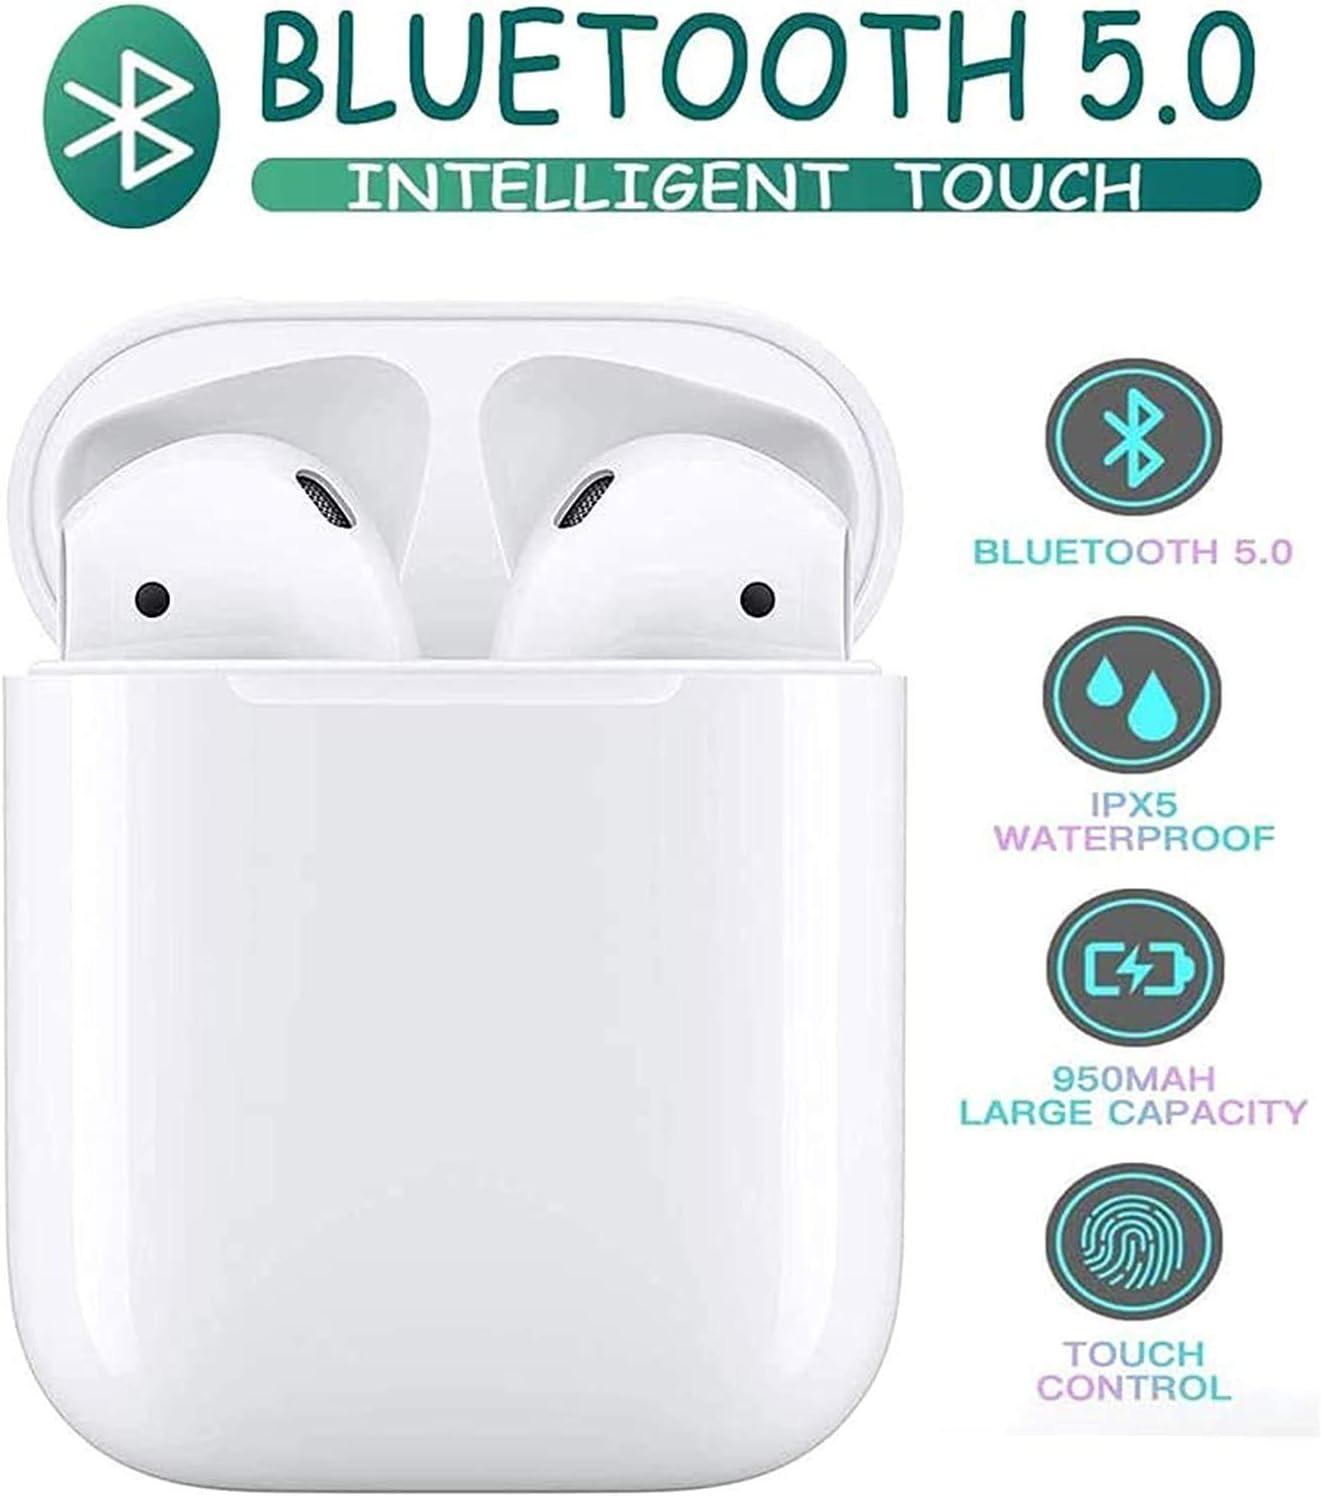 Kompatibel mit Allen Smart-Ger/äten-Wei/ß Bluetooth-Kopfh/örer,kabellose Touch-Kopfh/örer HiFi-Kopfh/örer In-Ear-Kopfh/örer Rauschunterdr/ückungskopfh/örer,Tragbare Sport-Bluetooth-Funkkopfh/örer